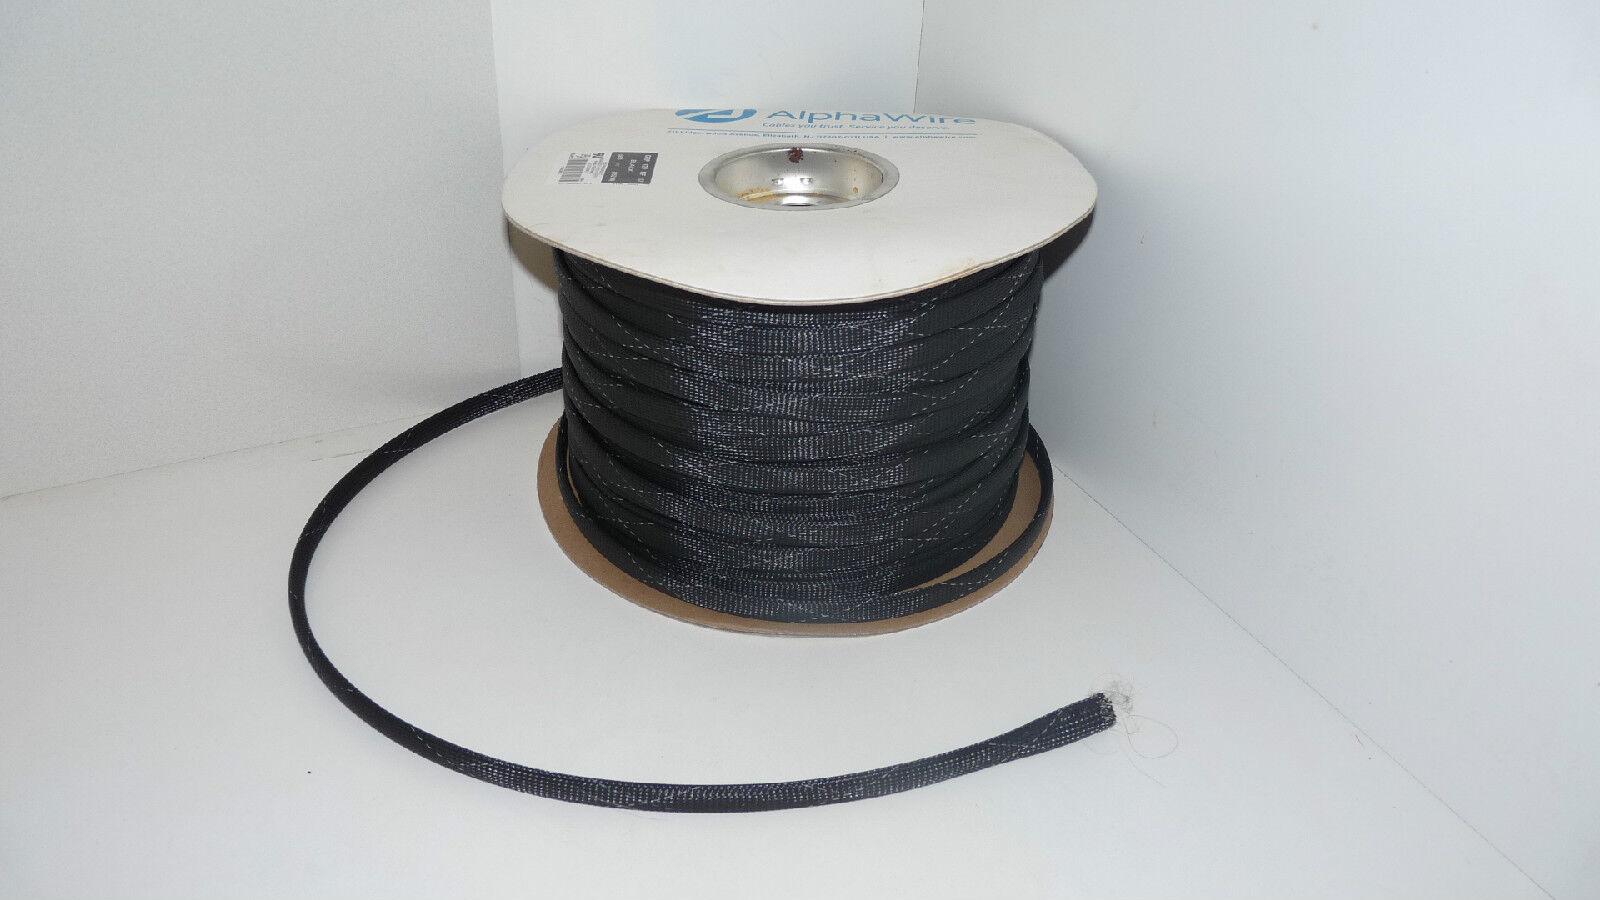 Alphawire de grp-120-nf12 Negro trenzado de Alphawire alambre de cable 1/2 Sleeving 500ft grp120nf12 a946dd